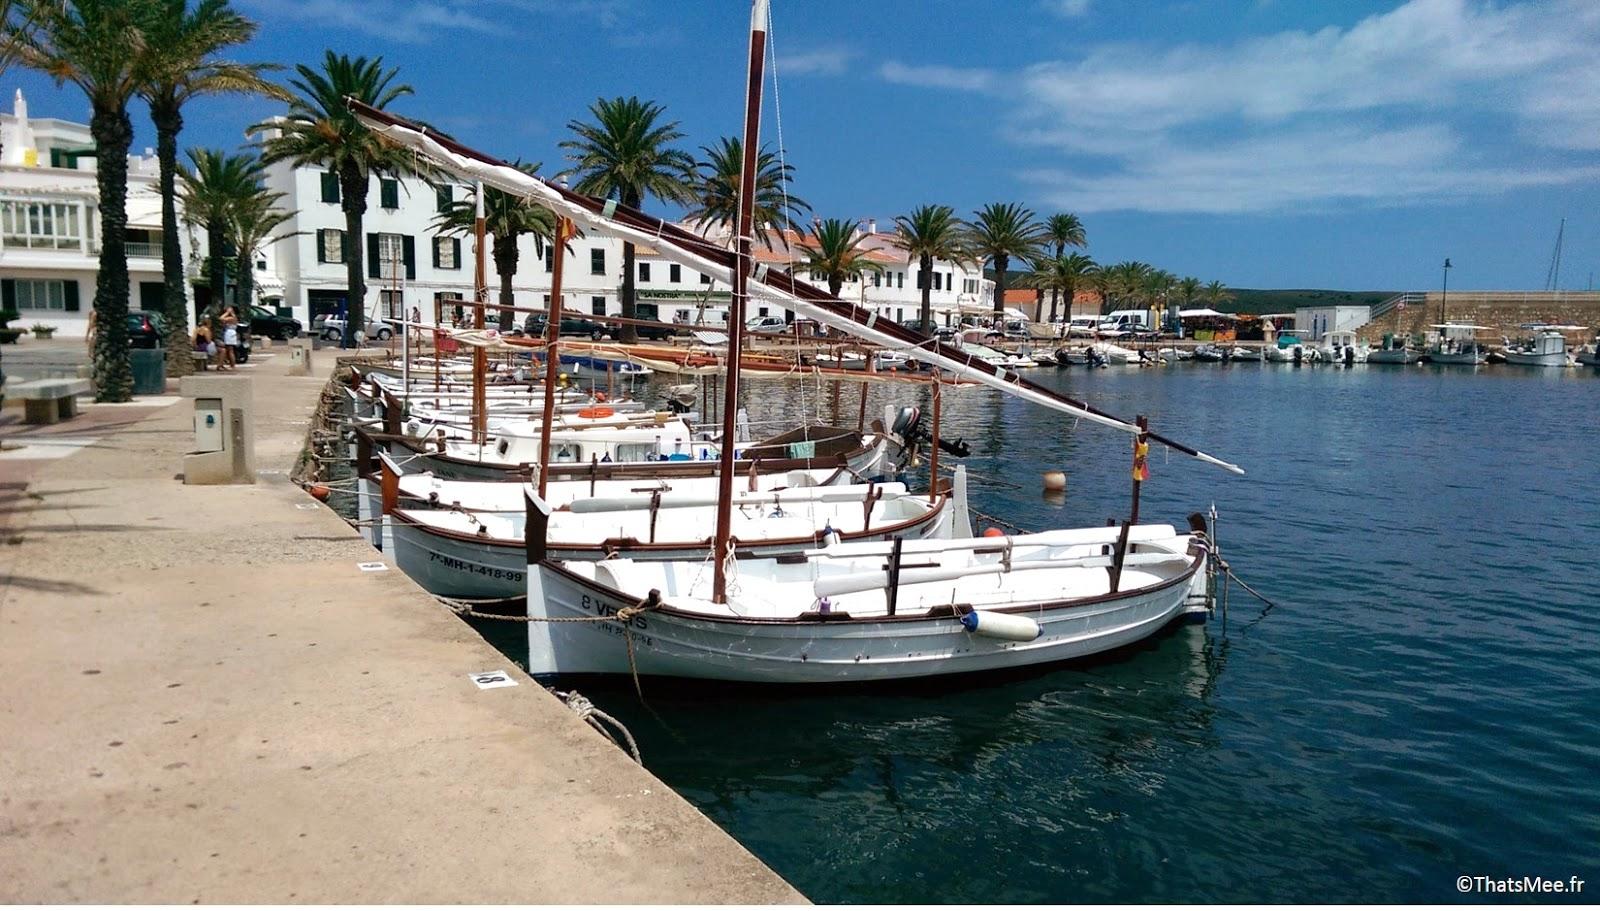 Port de Fornells Minorque Menorca calderata plat typique local